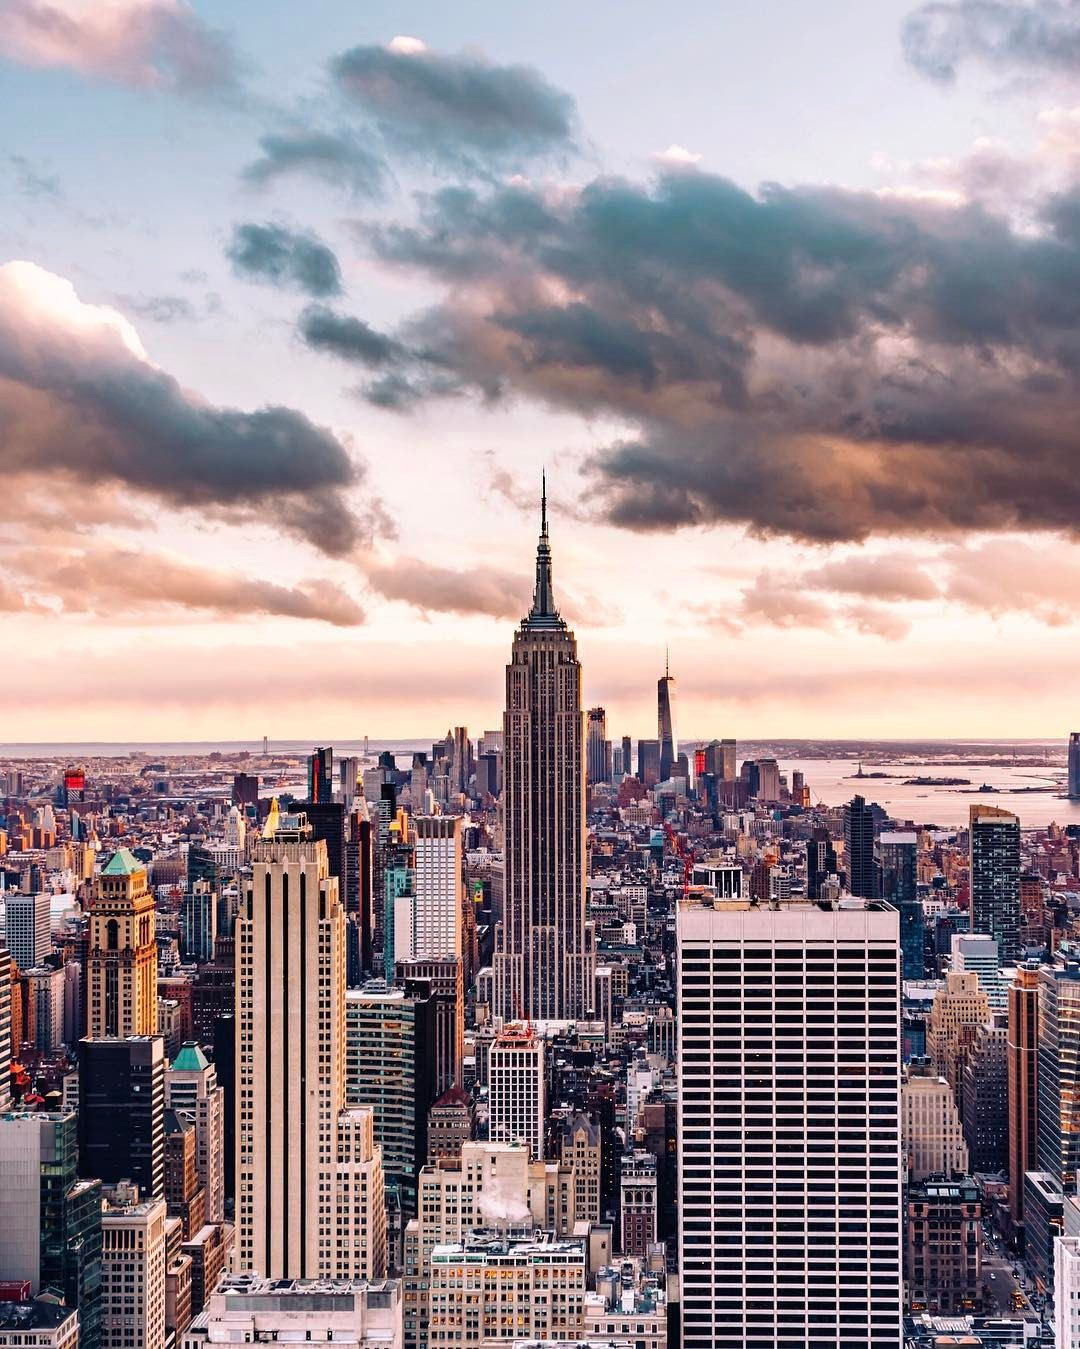 Empire State Building Sunset Shot Top Of Rock. - Gabzdematos